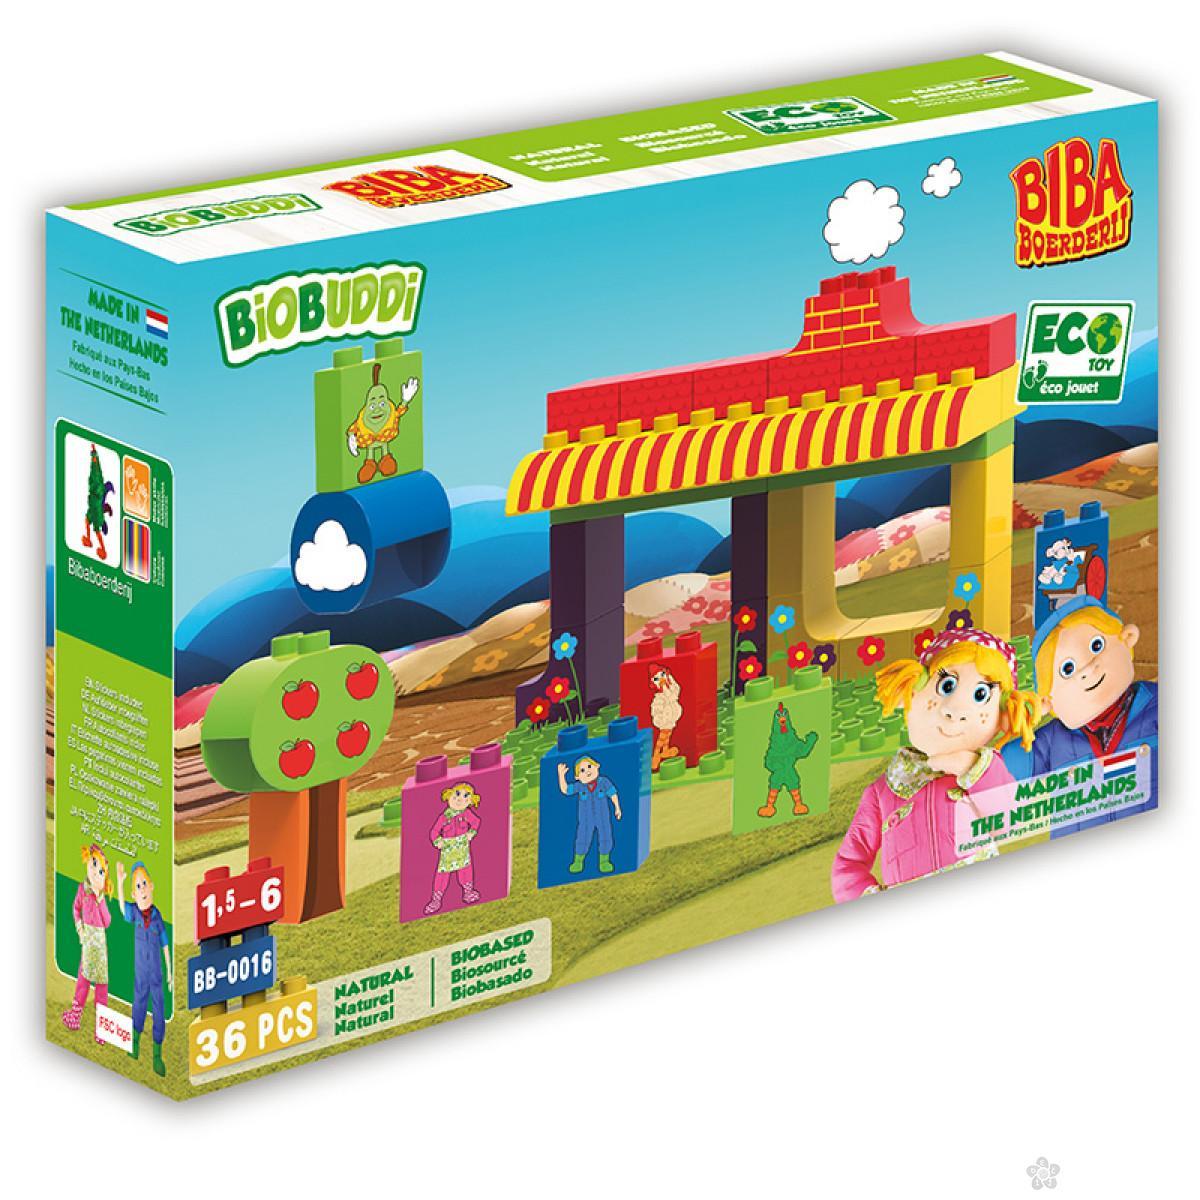 Kockice Biba farma BB-0016